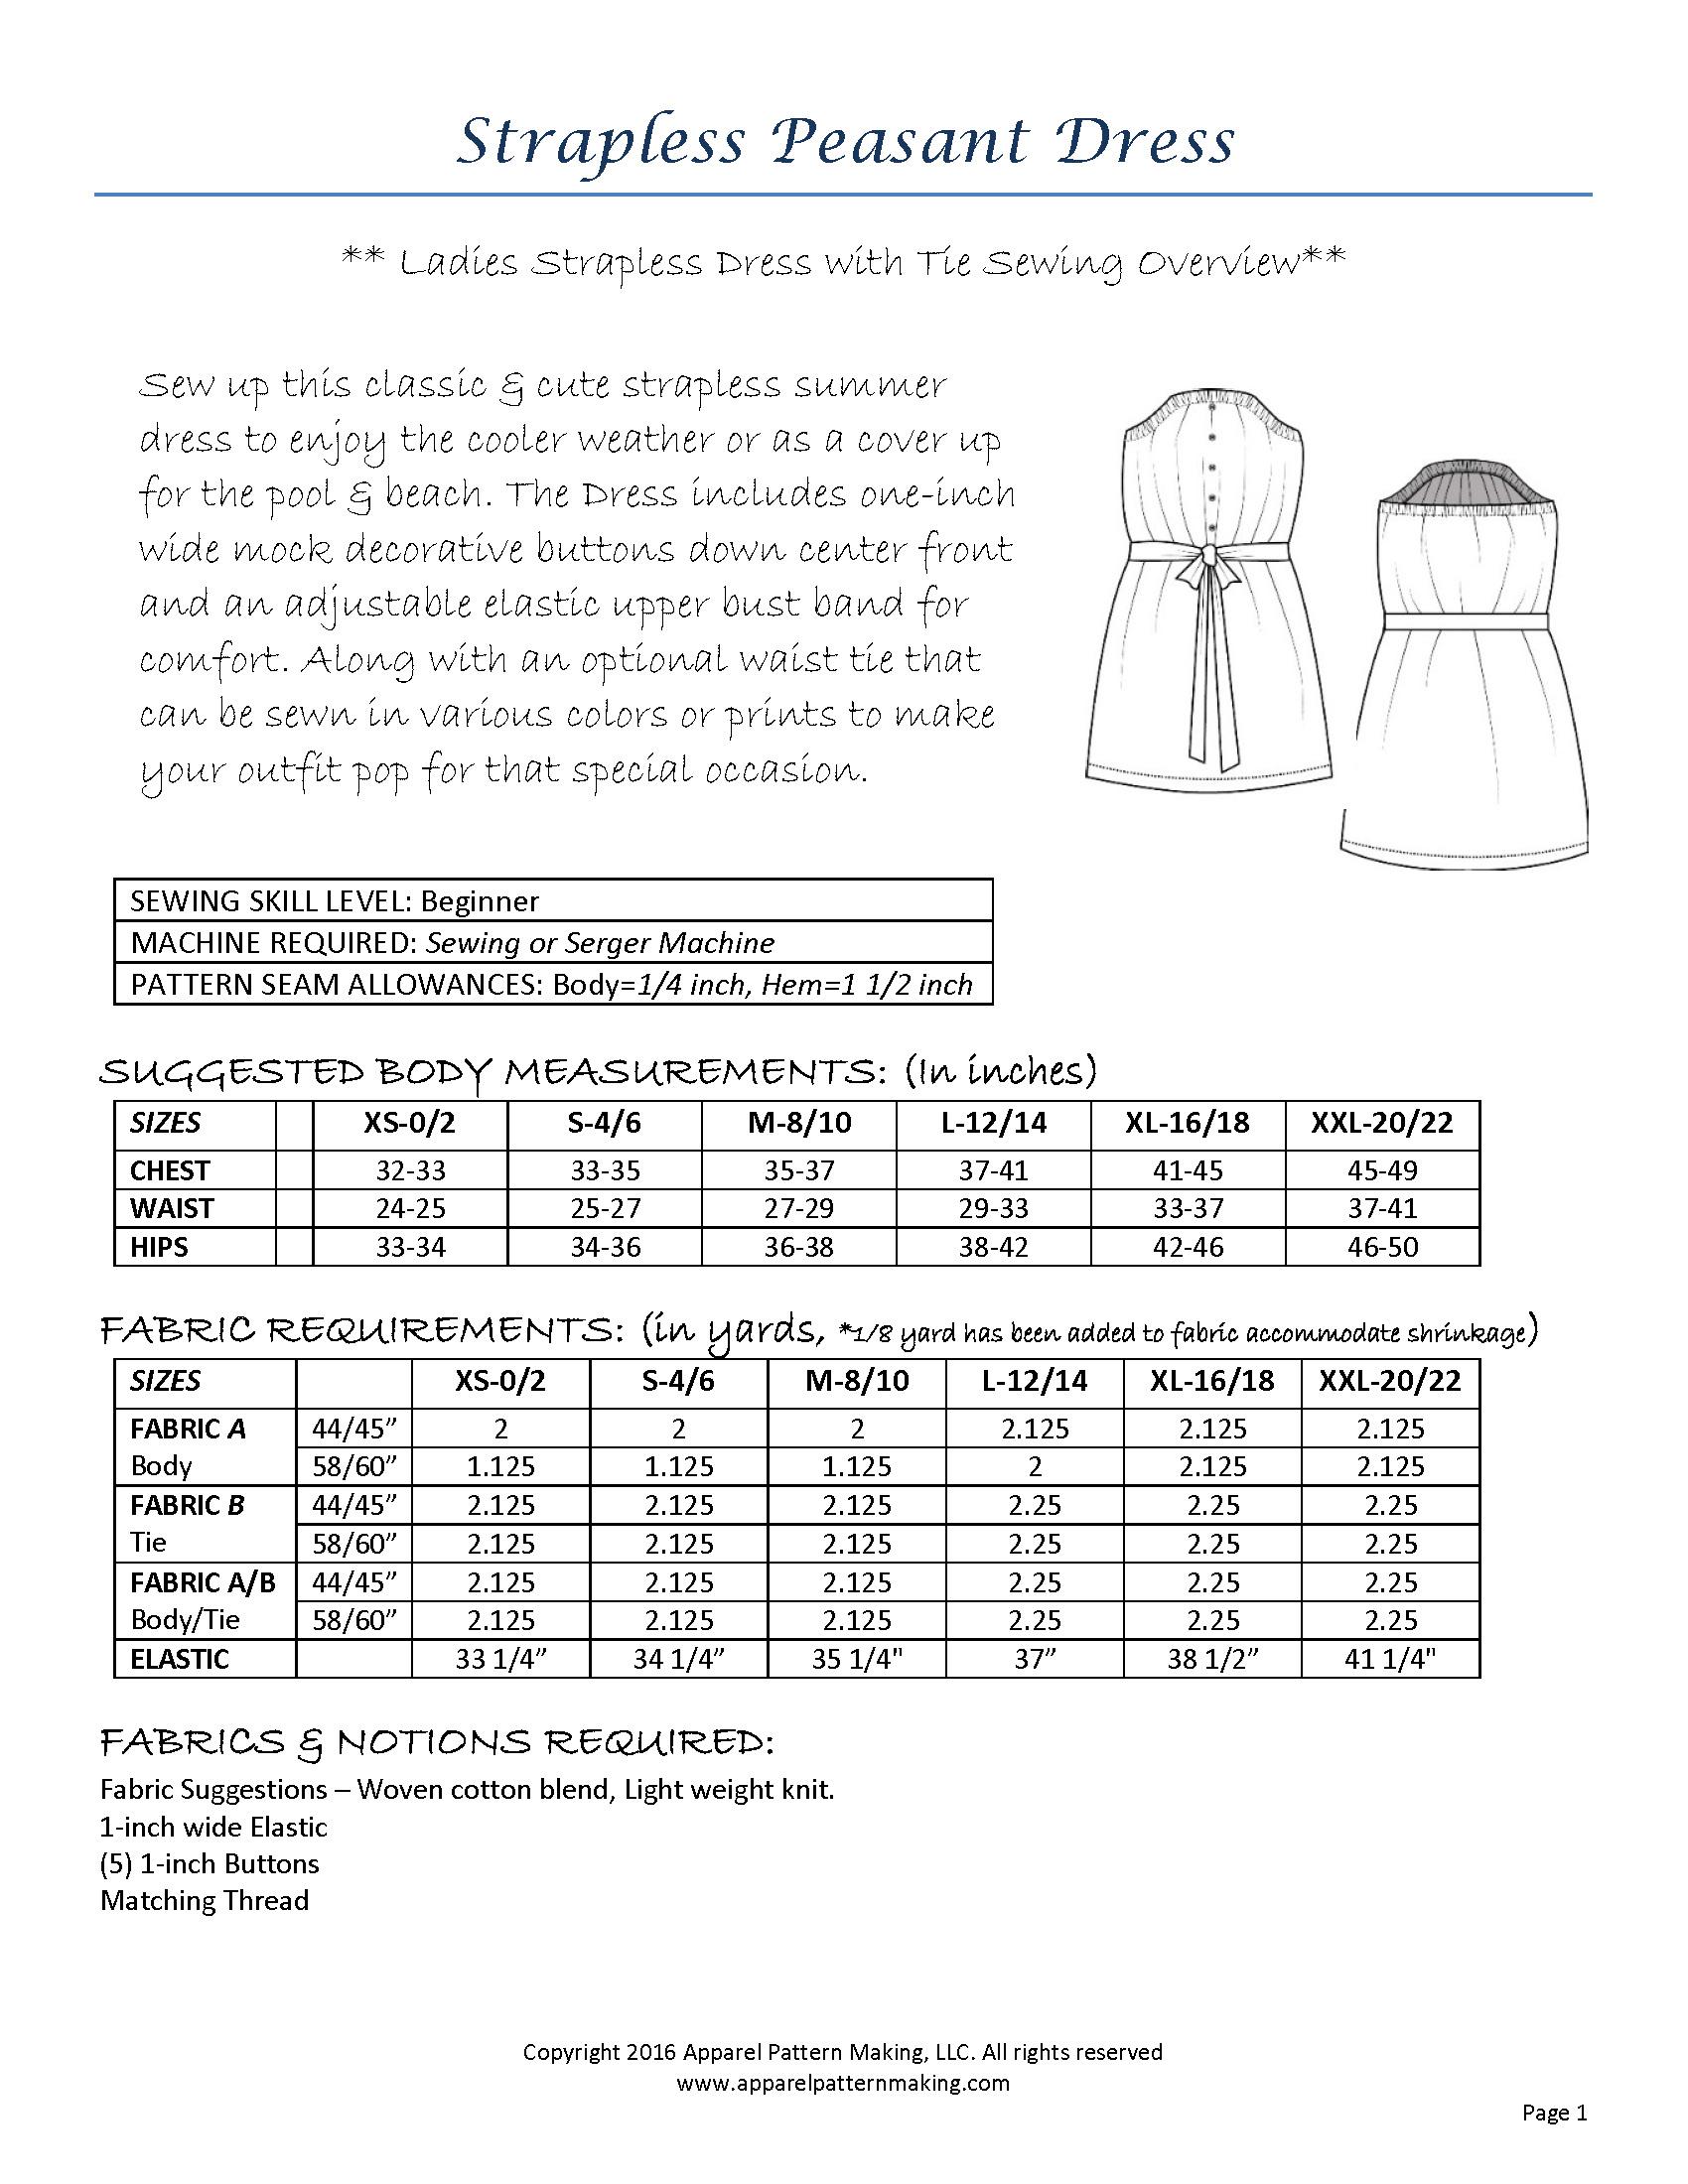 Ladies strapless peasant dress sewing pattern apparel pattern ladies strapless peasant dress sewing pattern jeuxipadfo Image collections